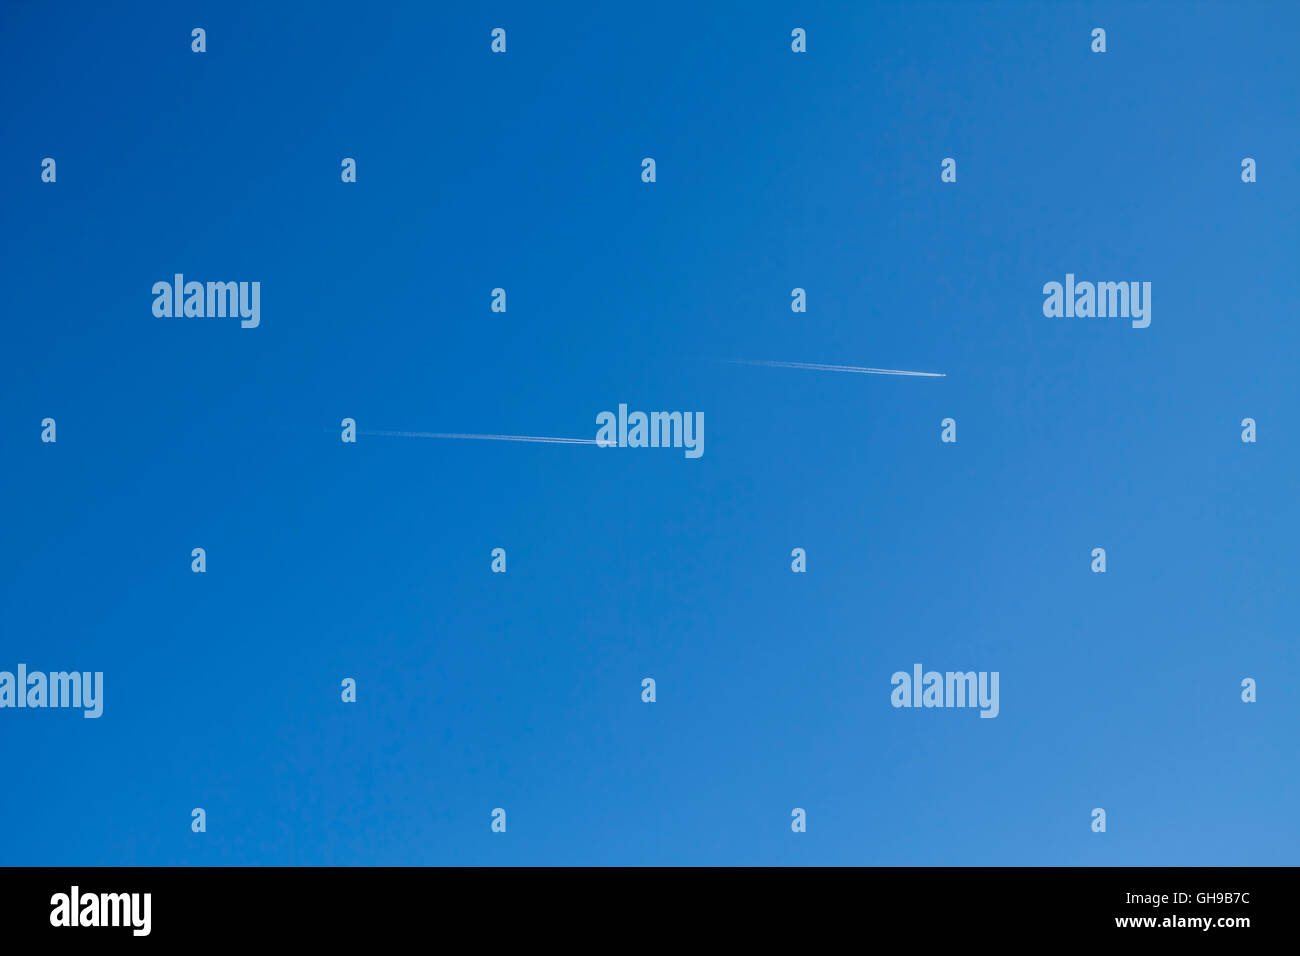 Flugzeuge am Himmel - Stock Image